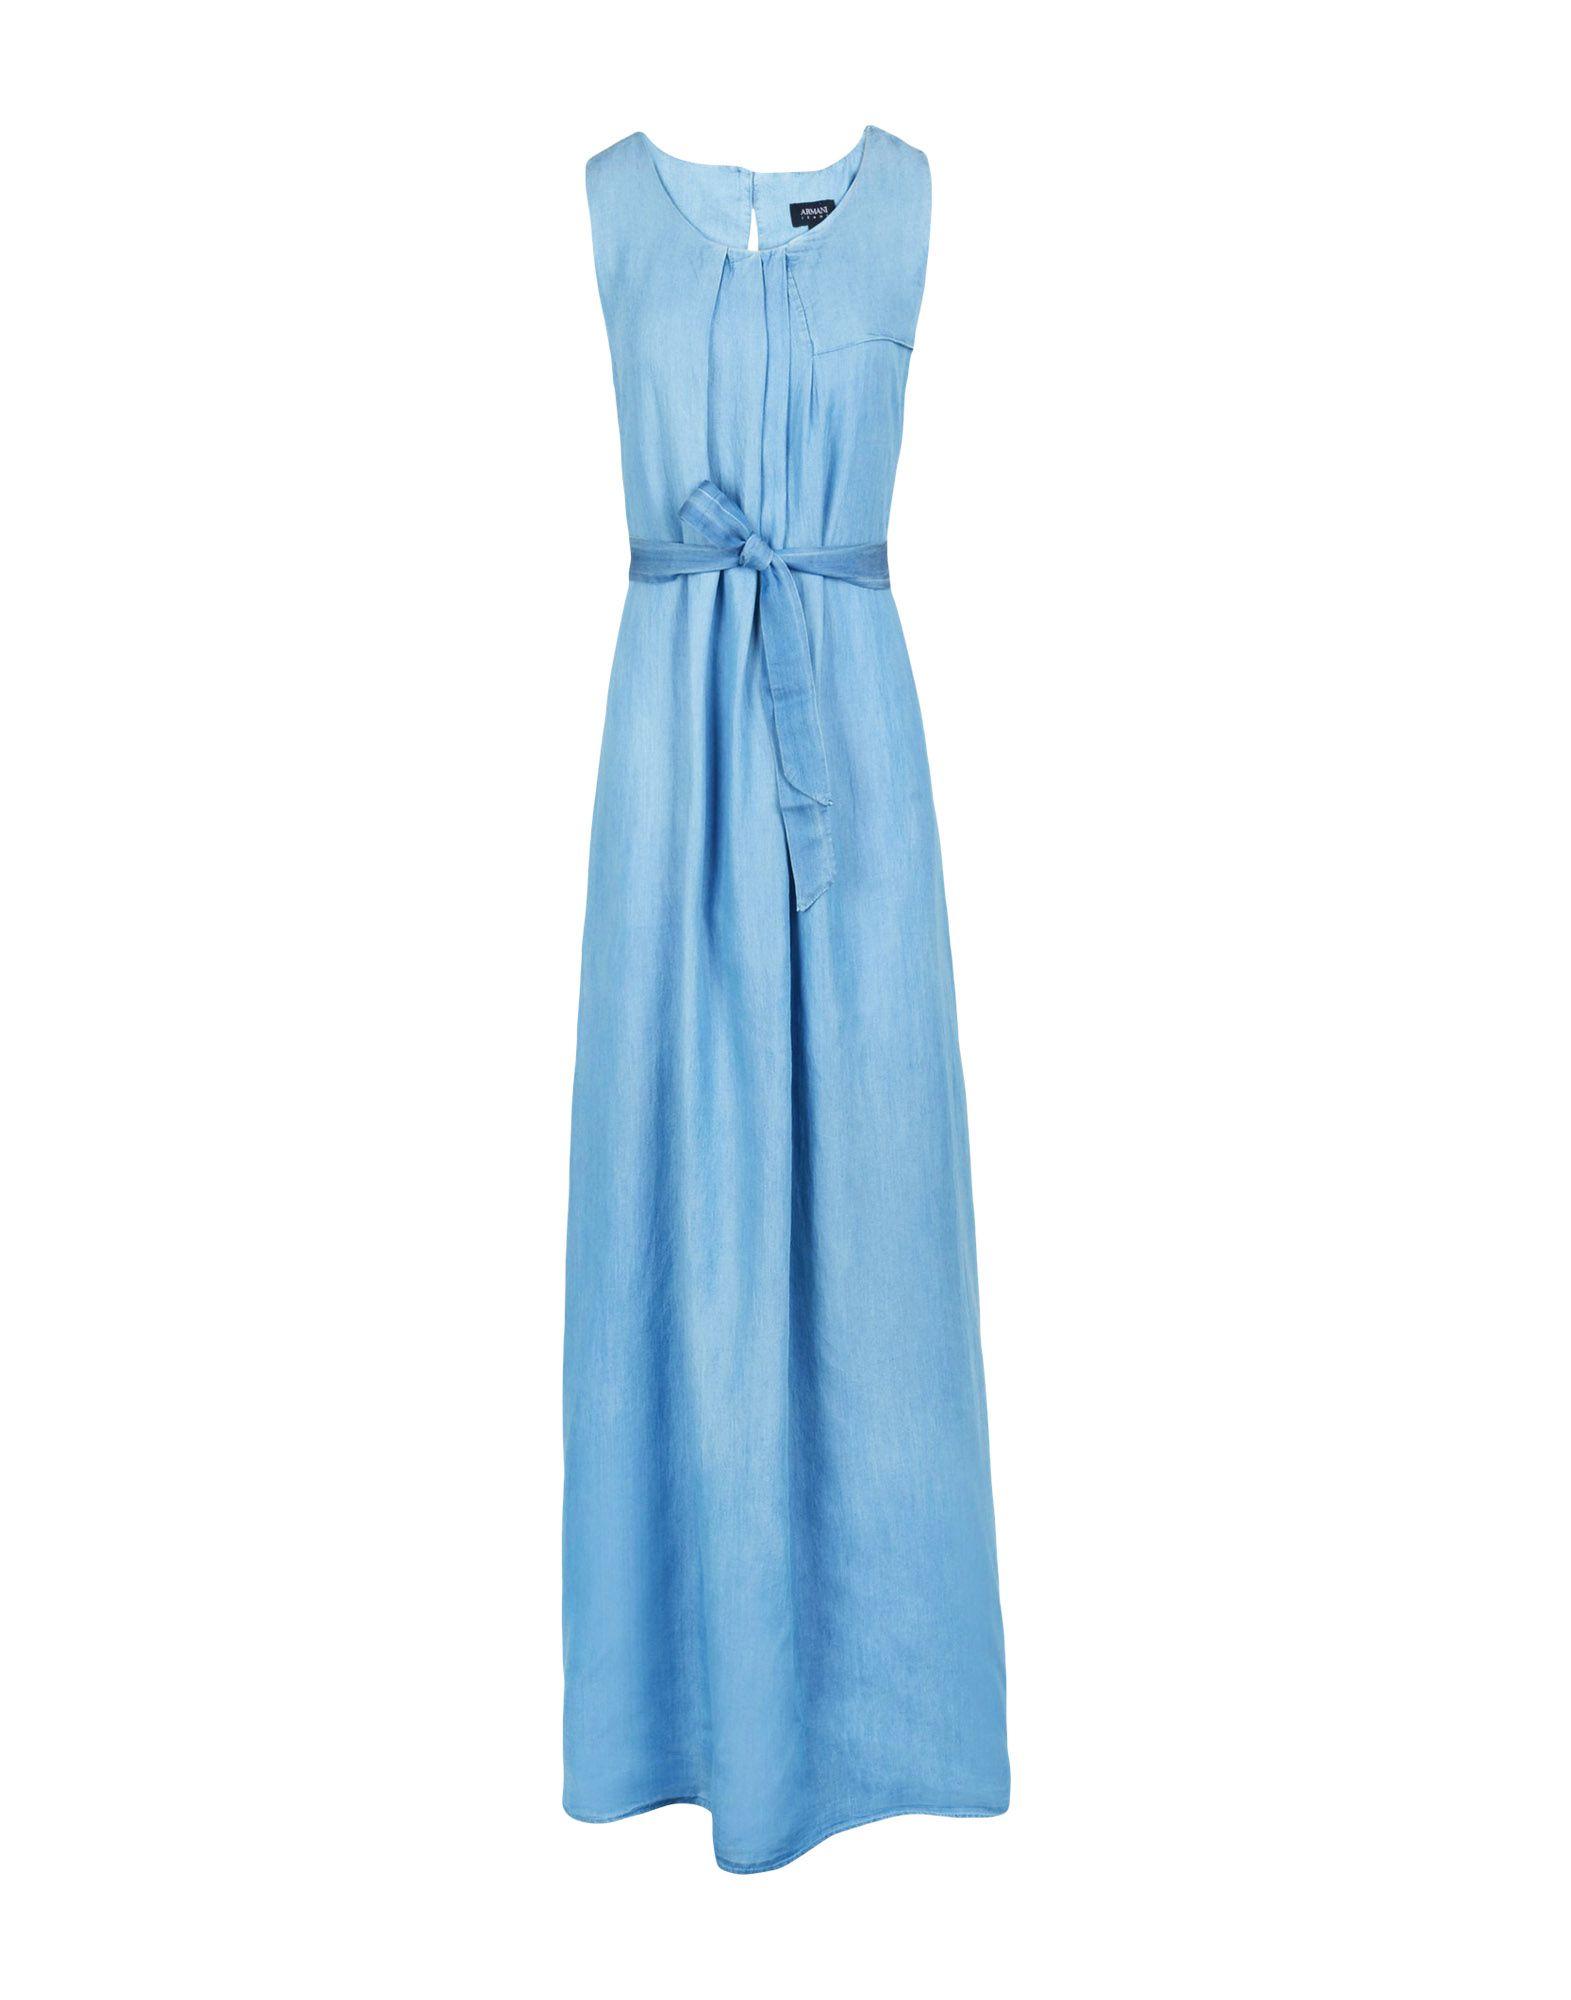 ARMANI JEANS Длинное платье платье armani jeans 6y5a11 5n2bz 1200